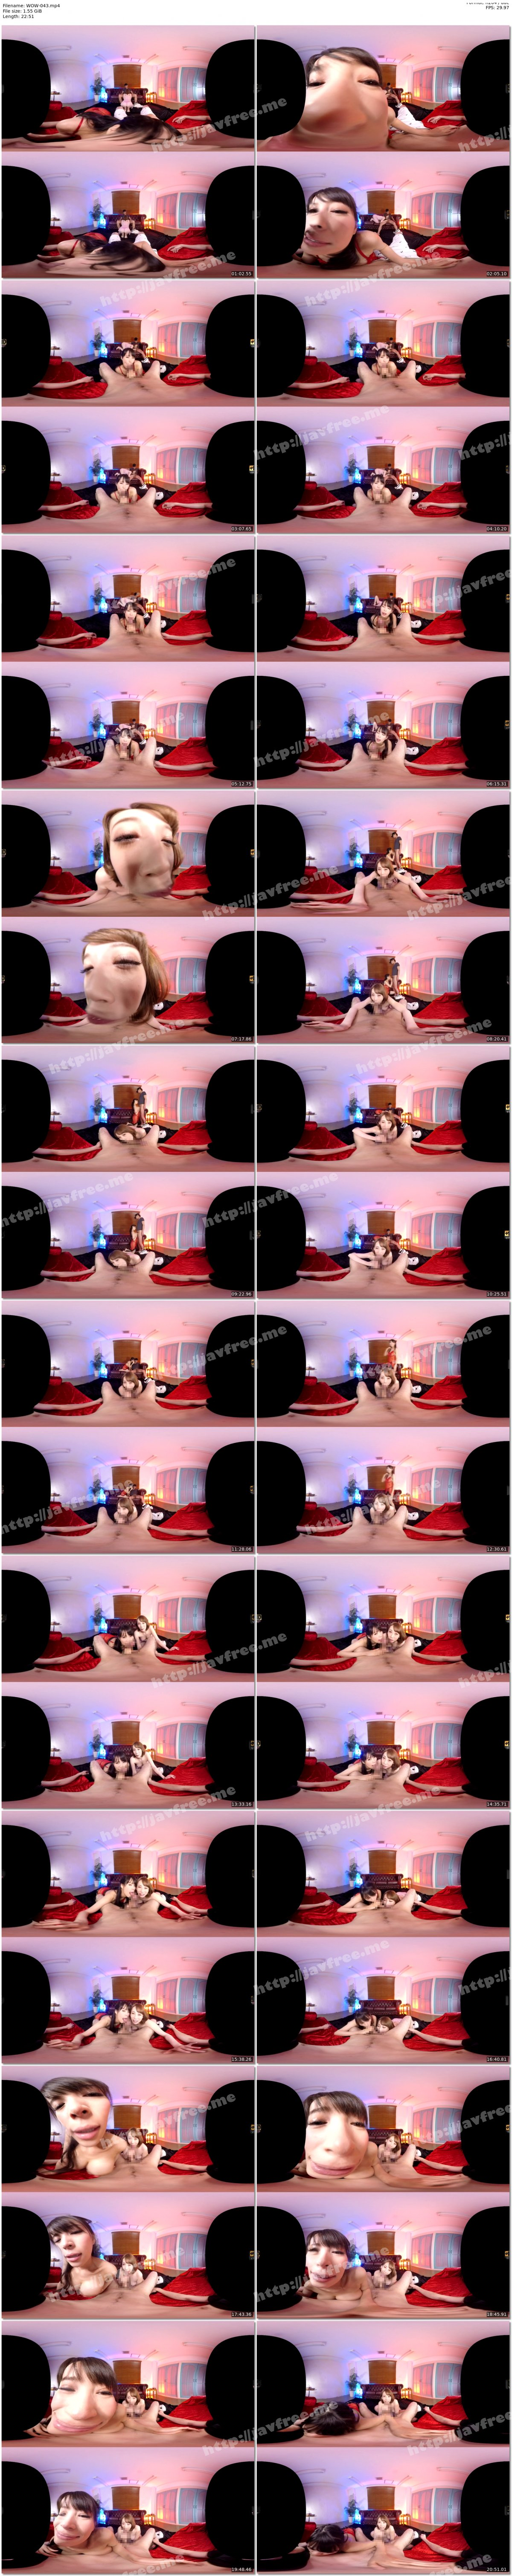 [WOW-043] 【VR】プロダクション直営AV女優在籍高級ピンクサロン 2回転ver. - image WOW-043 on https://javfree.me